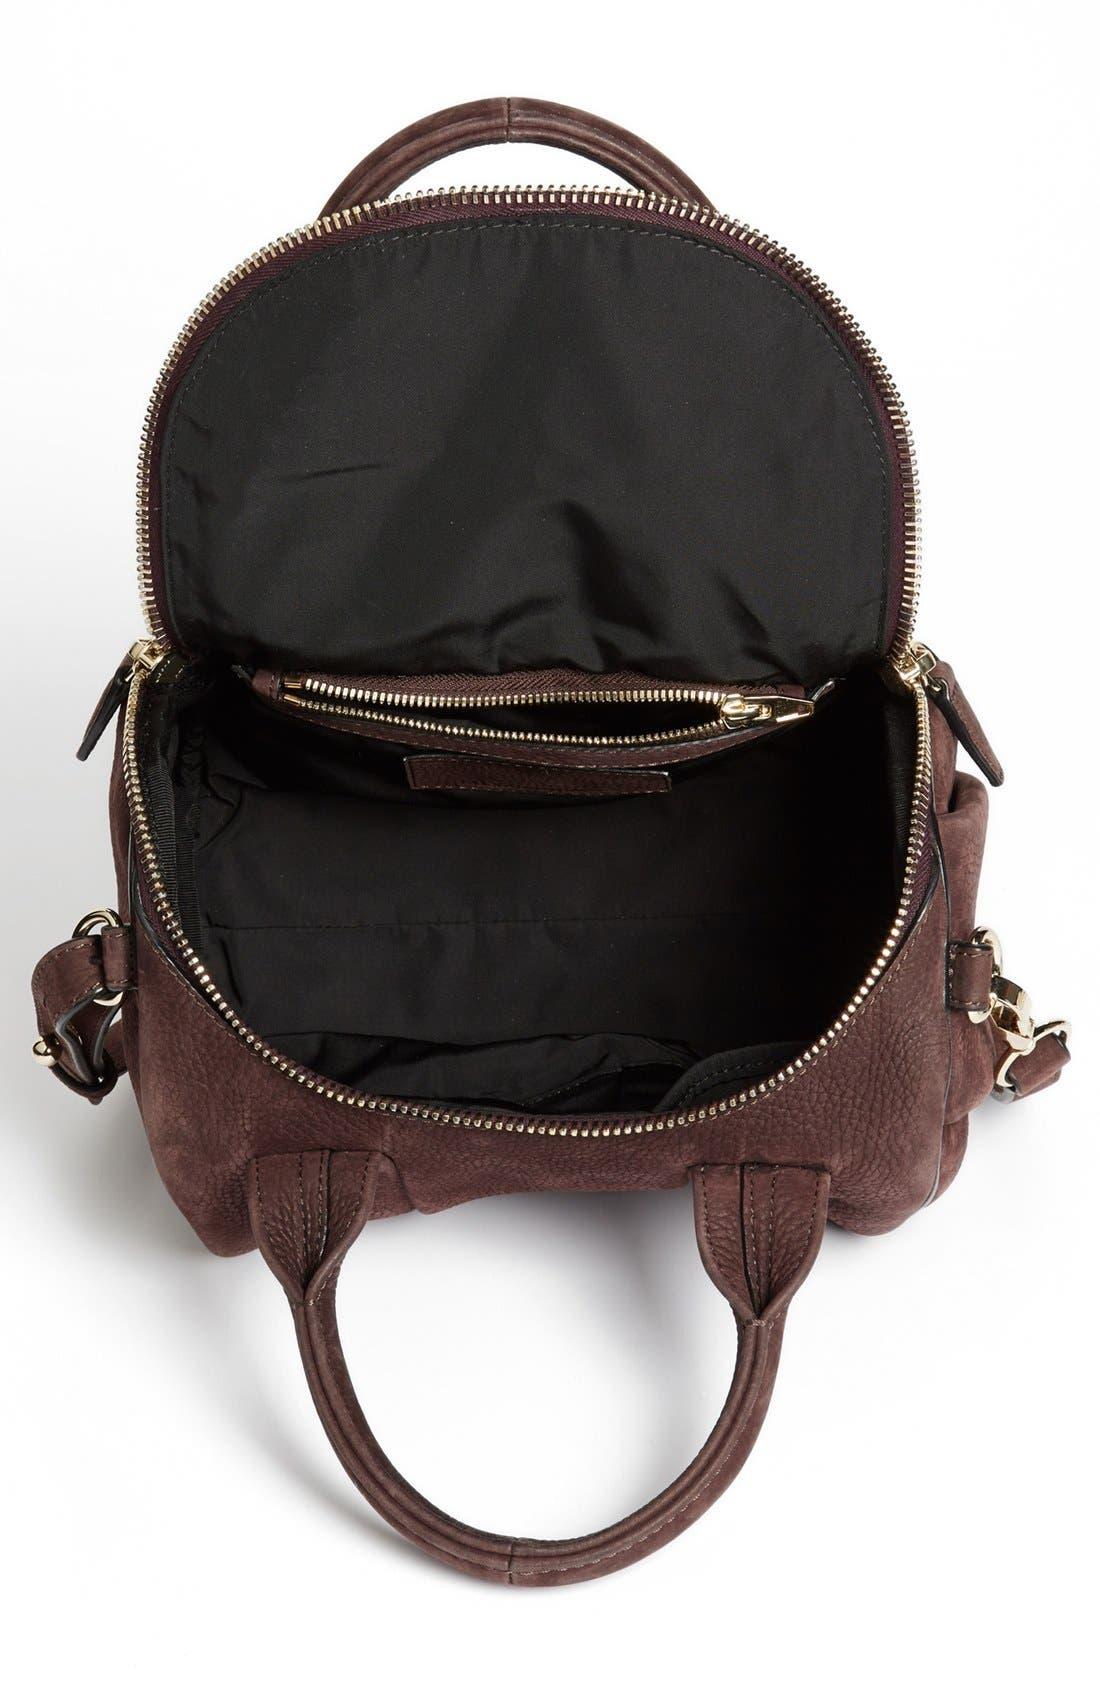 Alternate Image 2  - Alexander Wang 'Rockie - Pale Gold' Nubuck Leather Crossbody Bag